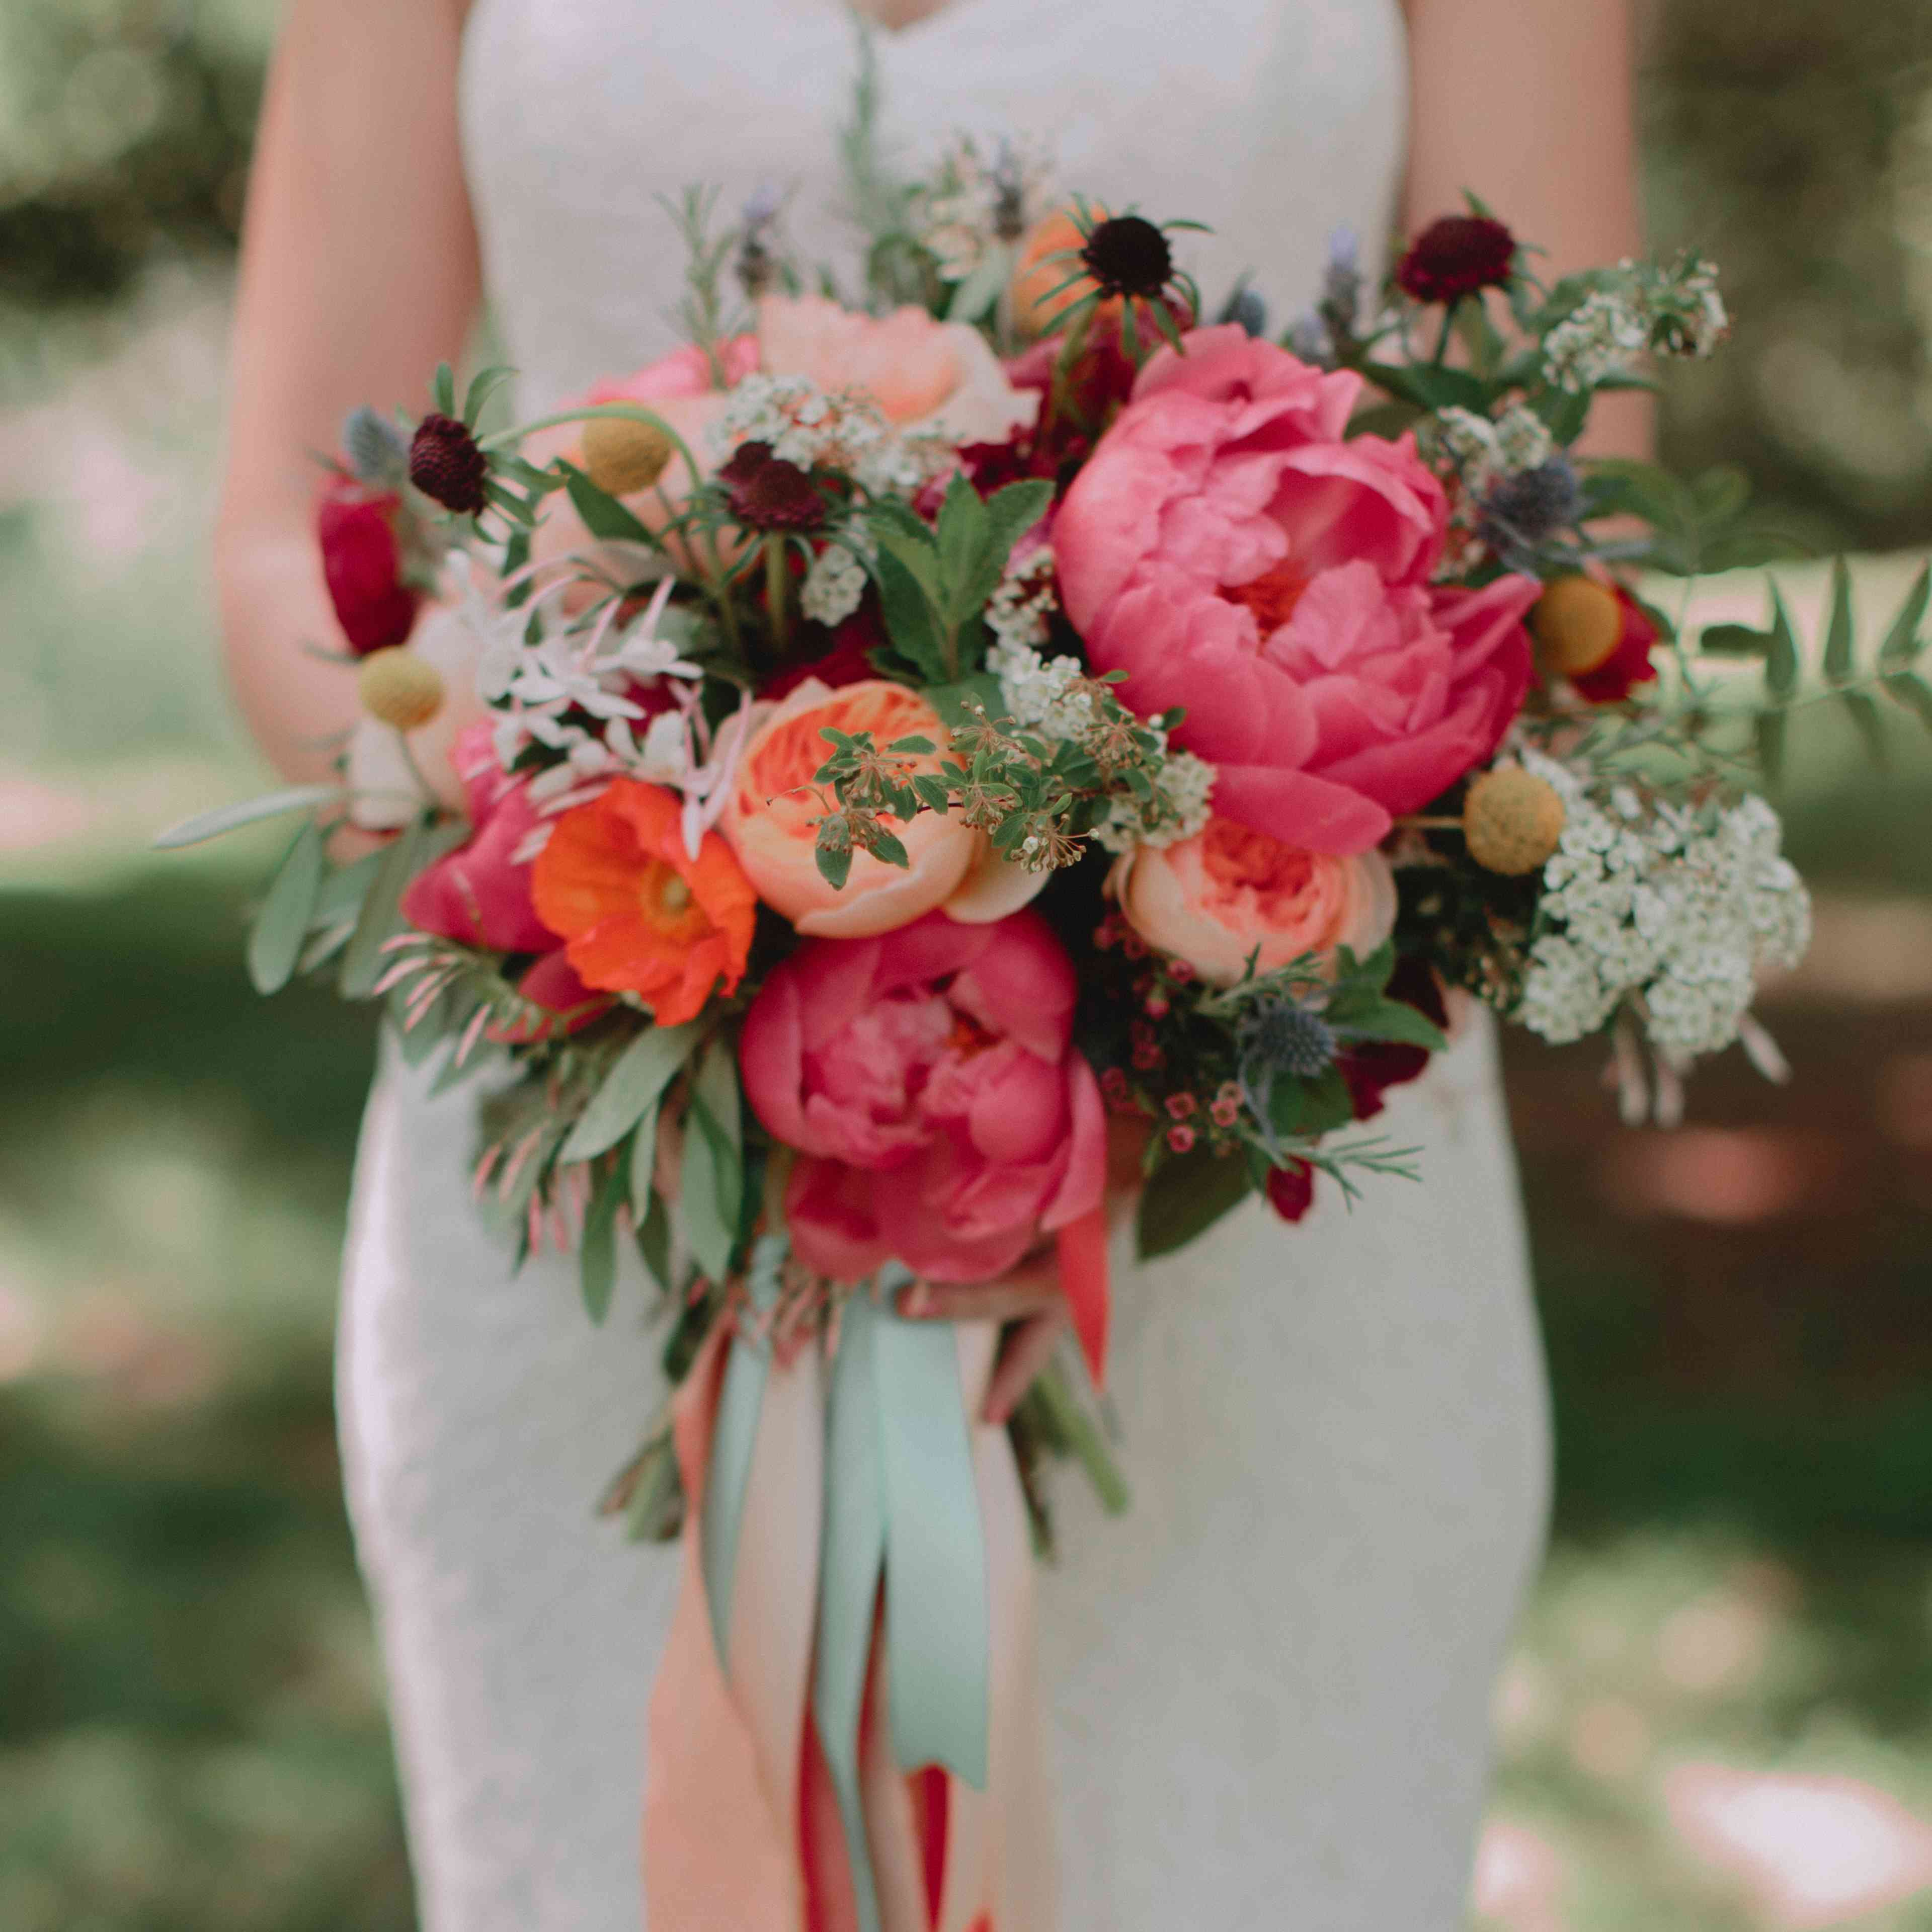 bridesmaid peony pink peonies,red wedding flowers red peony paper flowers ivory peony peonies flowers pink bride bouquet peony bouquet